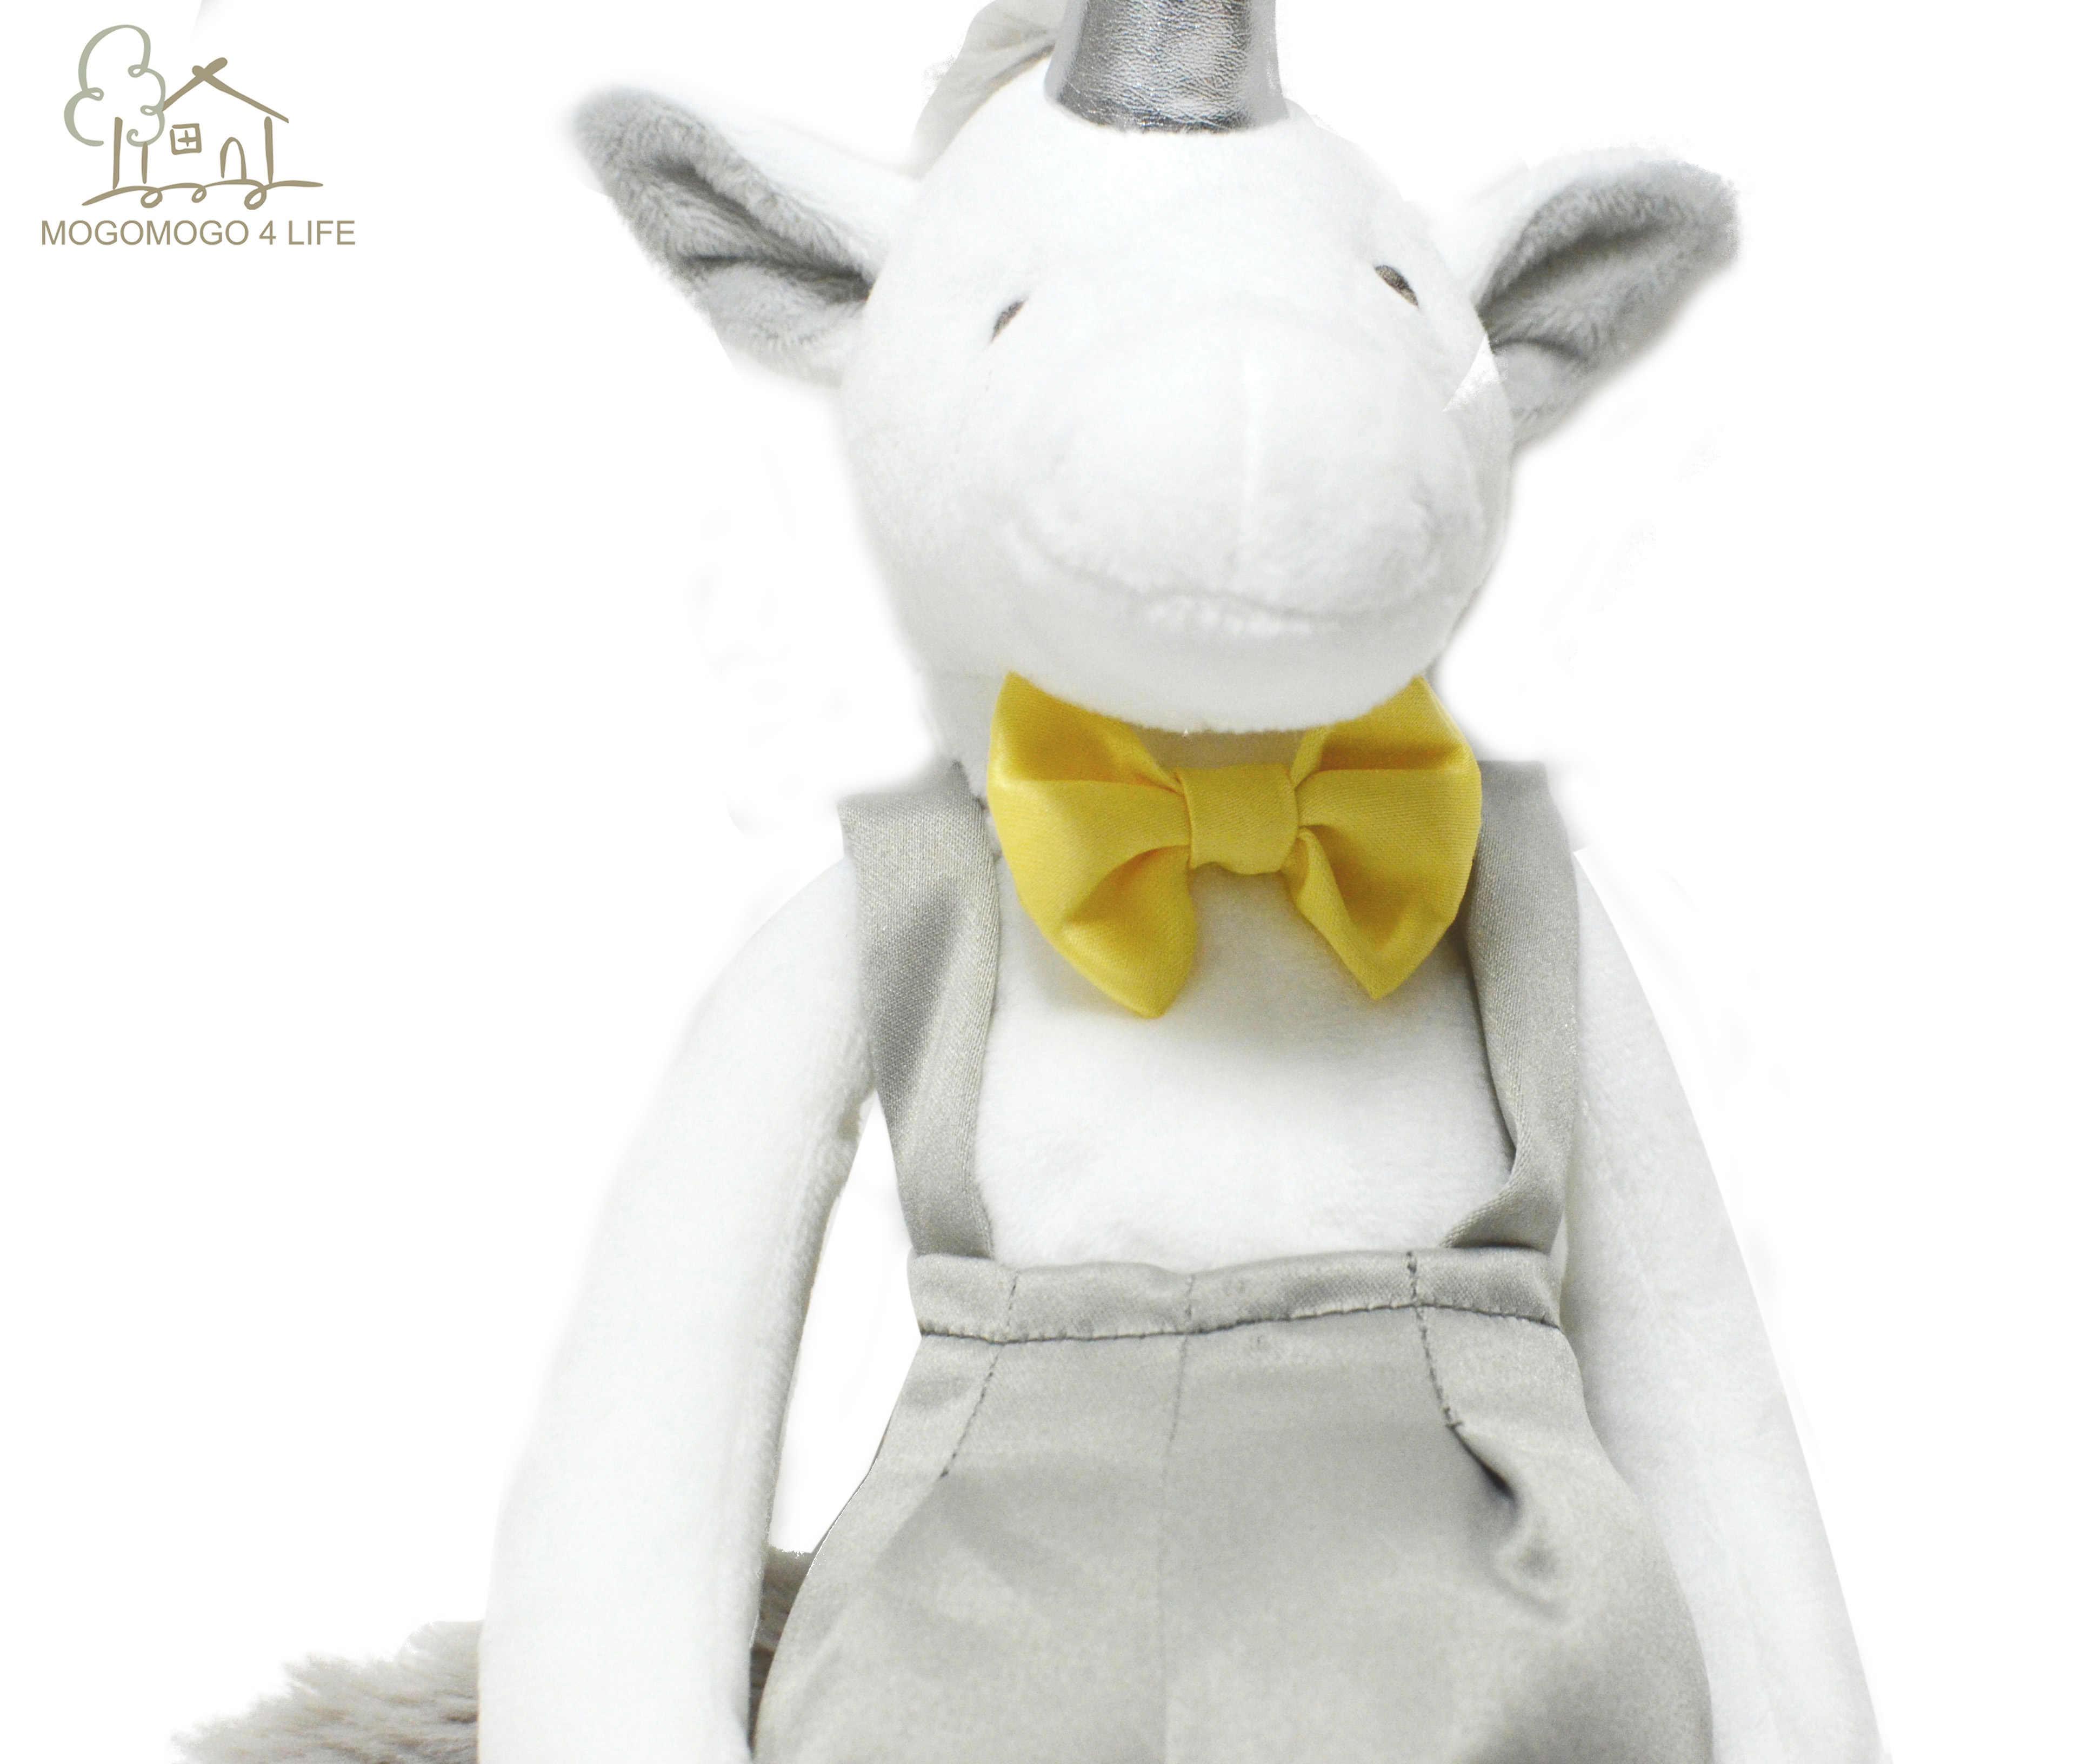 Luxury Unicorn เด็กของเล่นตุ๊กตาตุ๊กตาสัตว์เด็กวันเกิดของขวัญ Handmade Silver Horn ม้า Overalls Dressd Soft ของเล่น